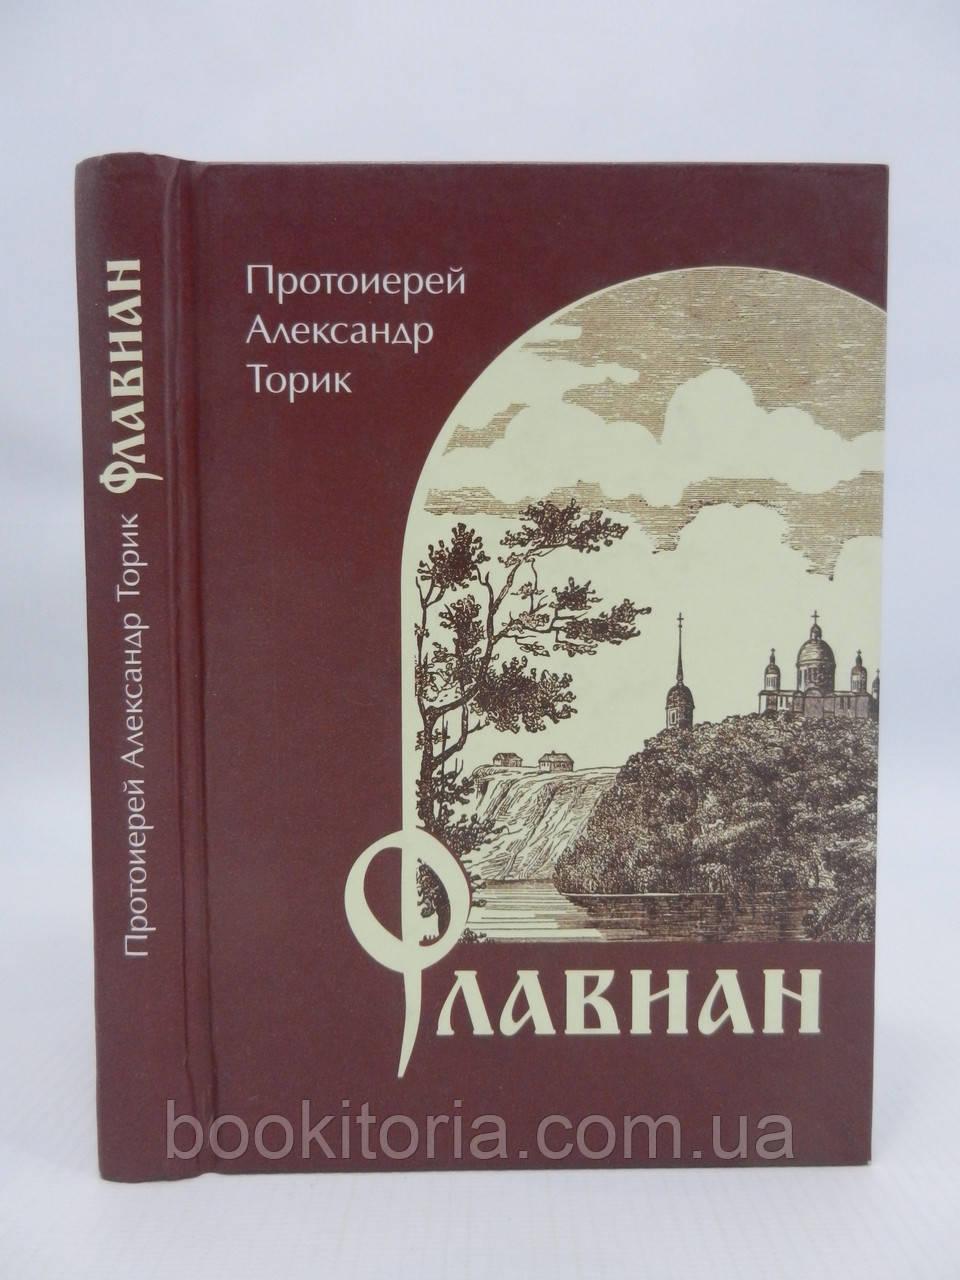 Протоиерей Александр Торик. Флавиан (б/у).